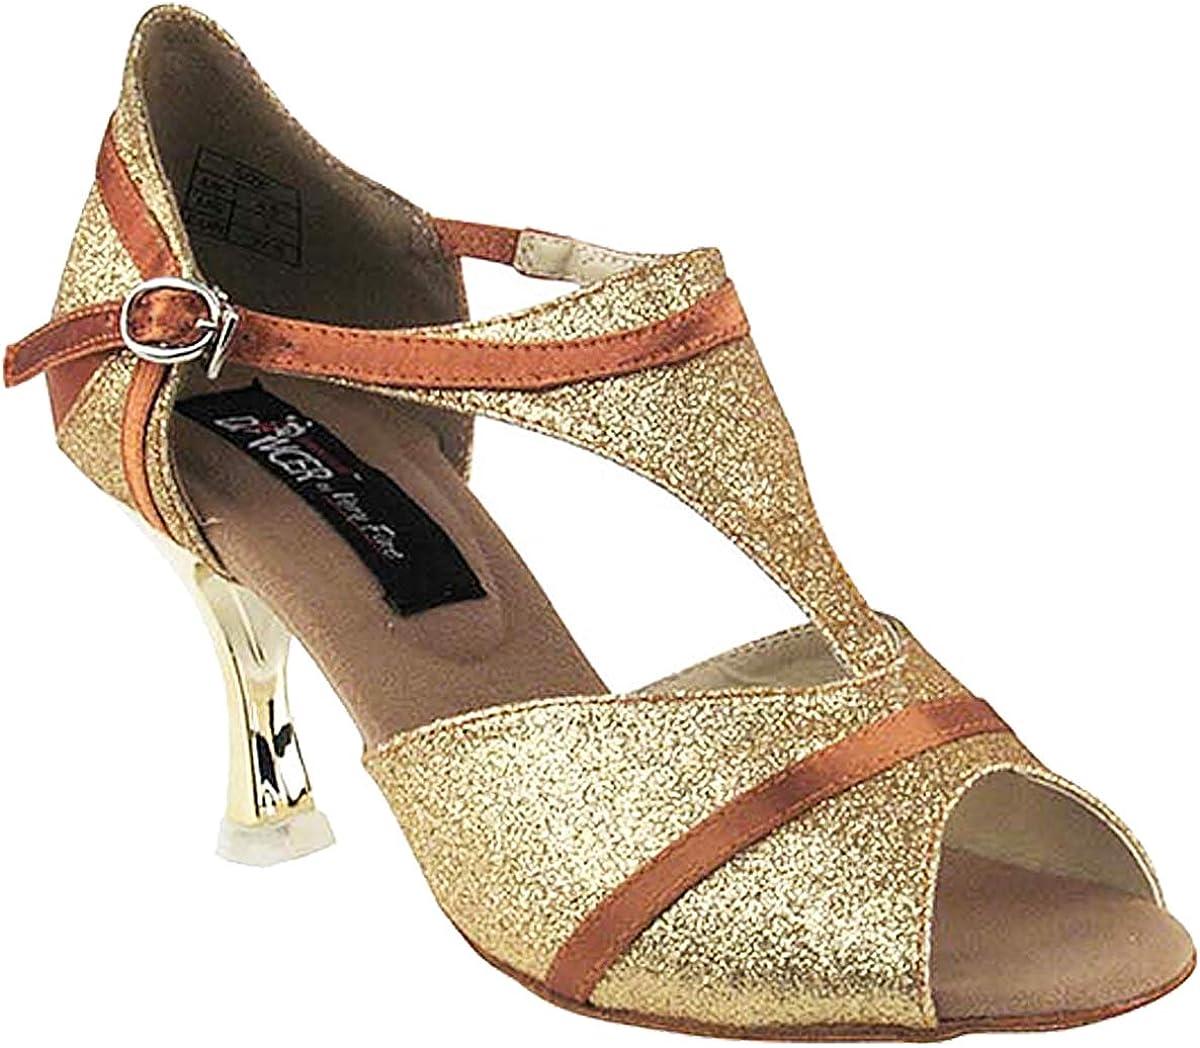 Women's Ballroom Dance Shoes Tango Wedding Salsa Shoes CD3007EB Comfortable-Very Fine 3